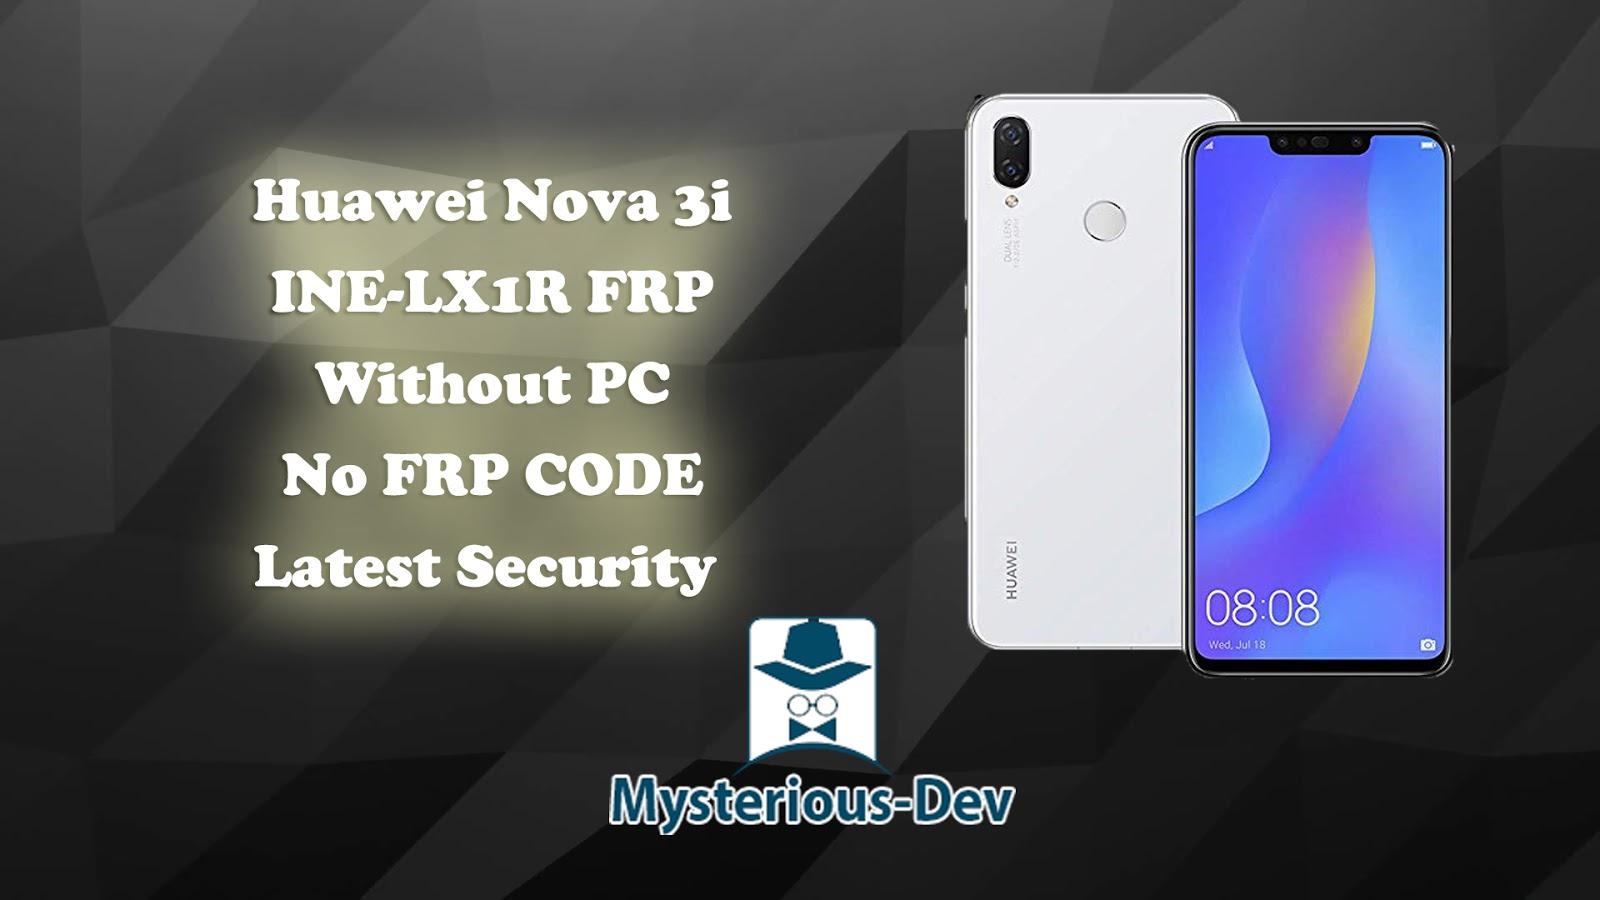 Huawei Nova 3i INE-LX1R FRP